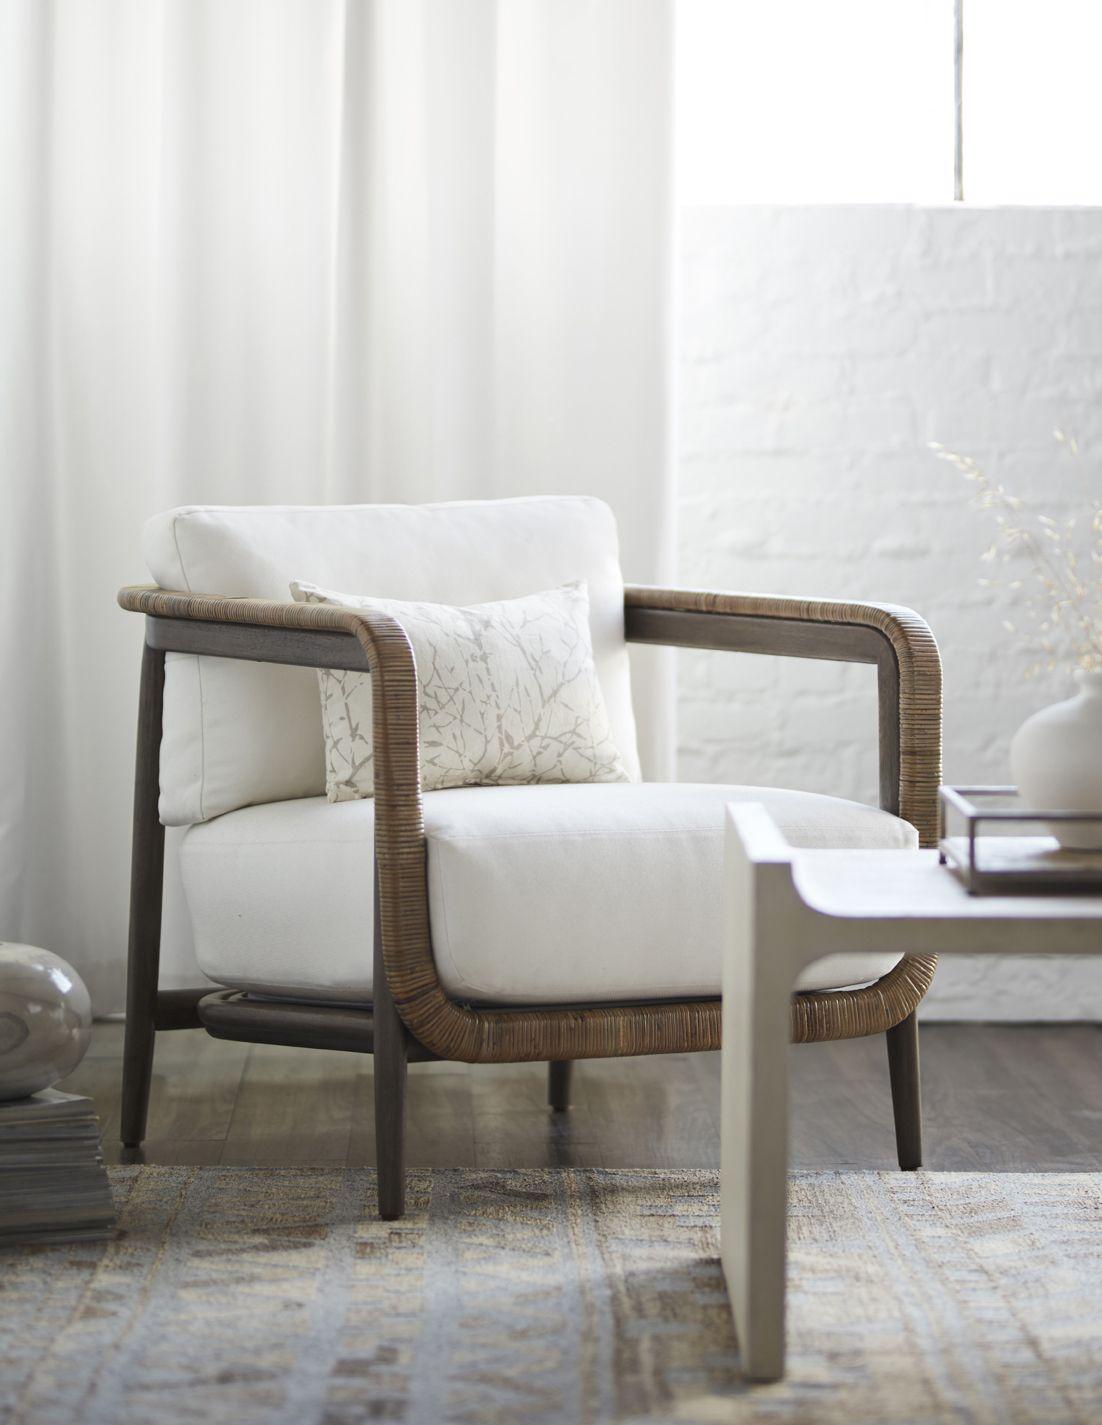 Best Palecek Duvall Lounge Chair Hardwood Frame Legs And Pole 400 x 300